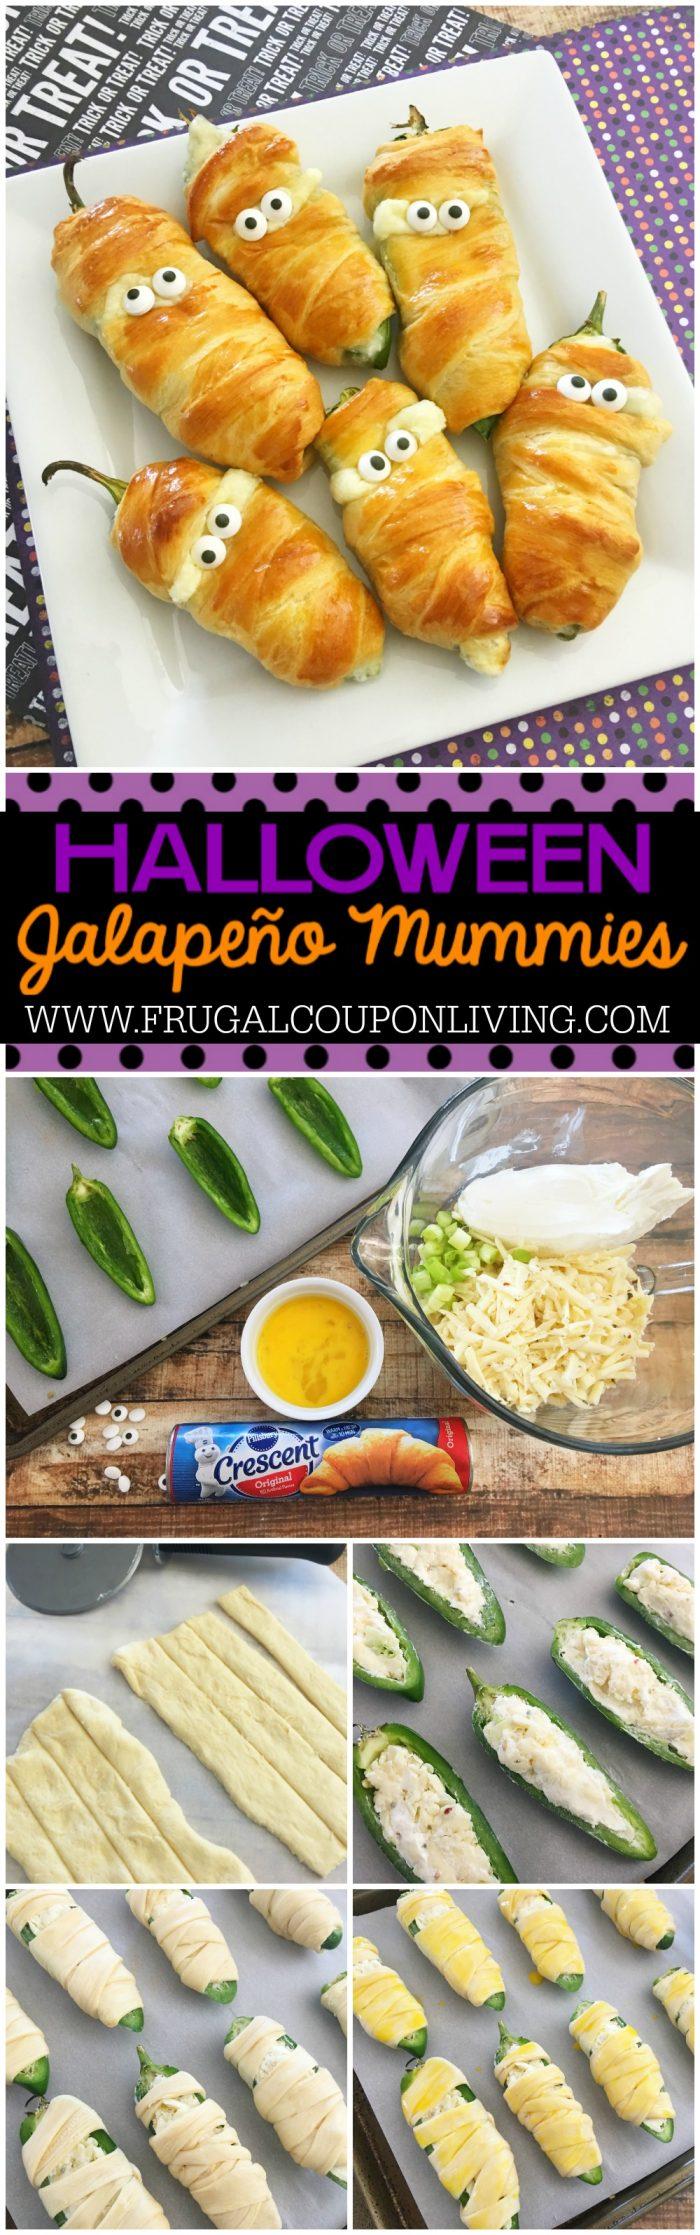 Halloween-Jalapeño-Mummies-long-collage-frugal-coupon-living